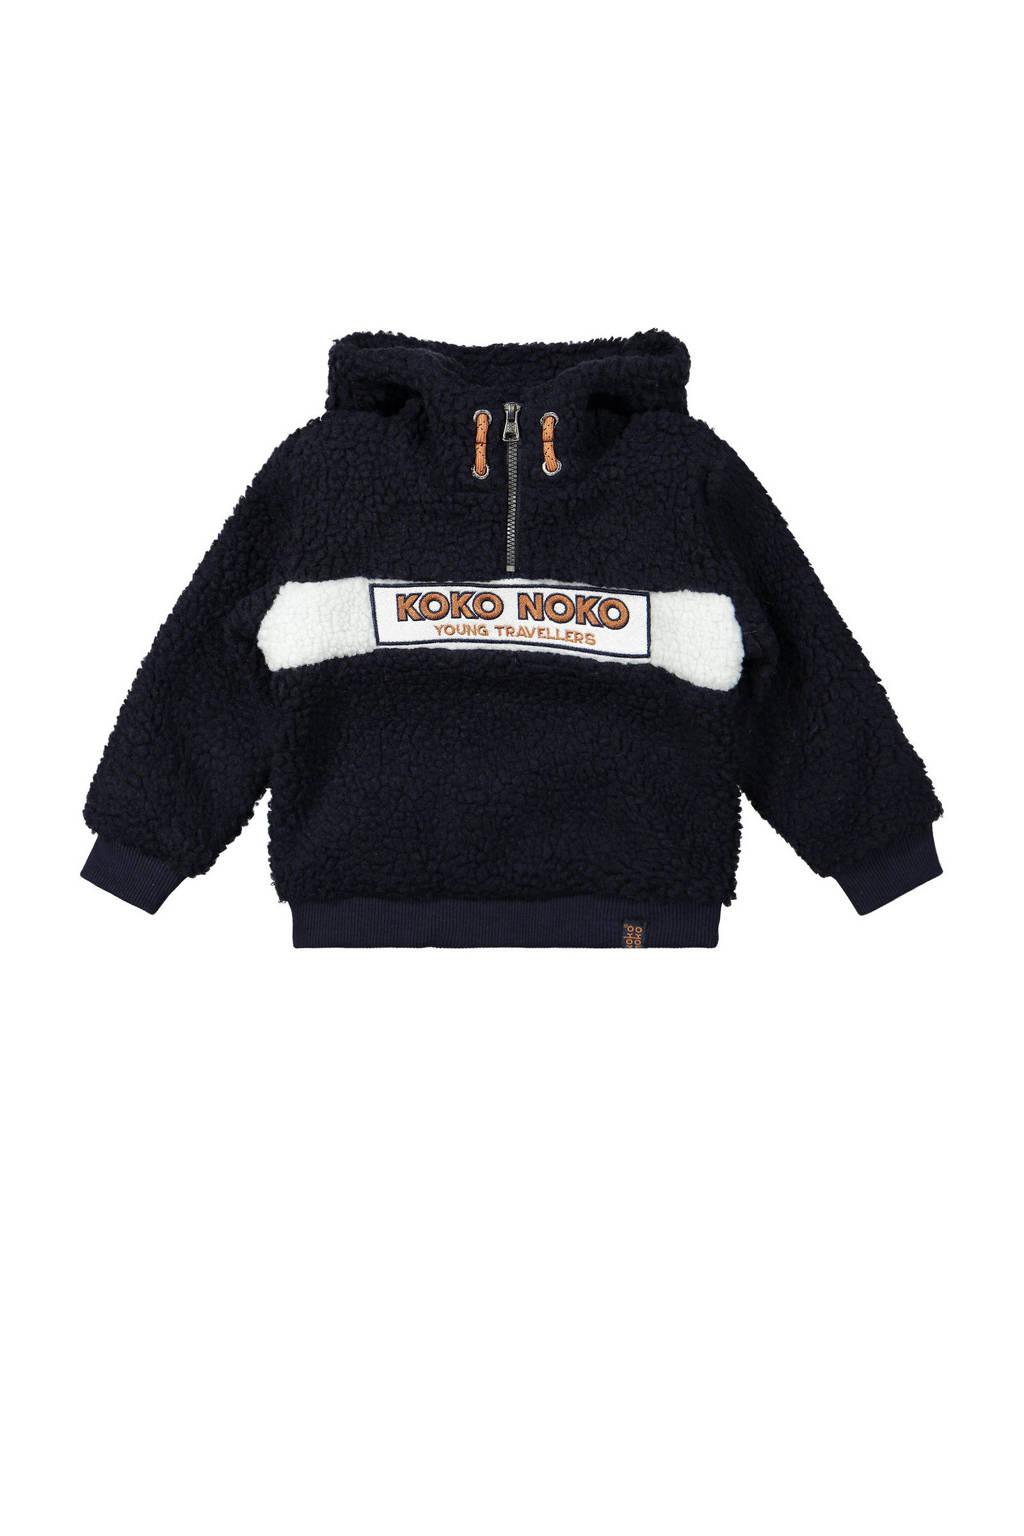 Koko Noko hoodie met logo donkerblauw/wit, Donkerblauw/wit